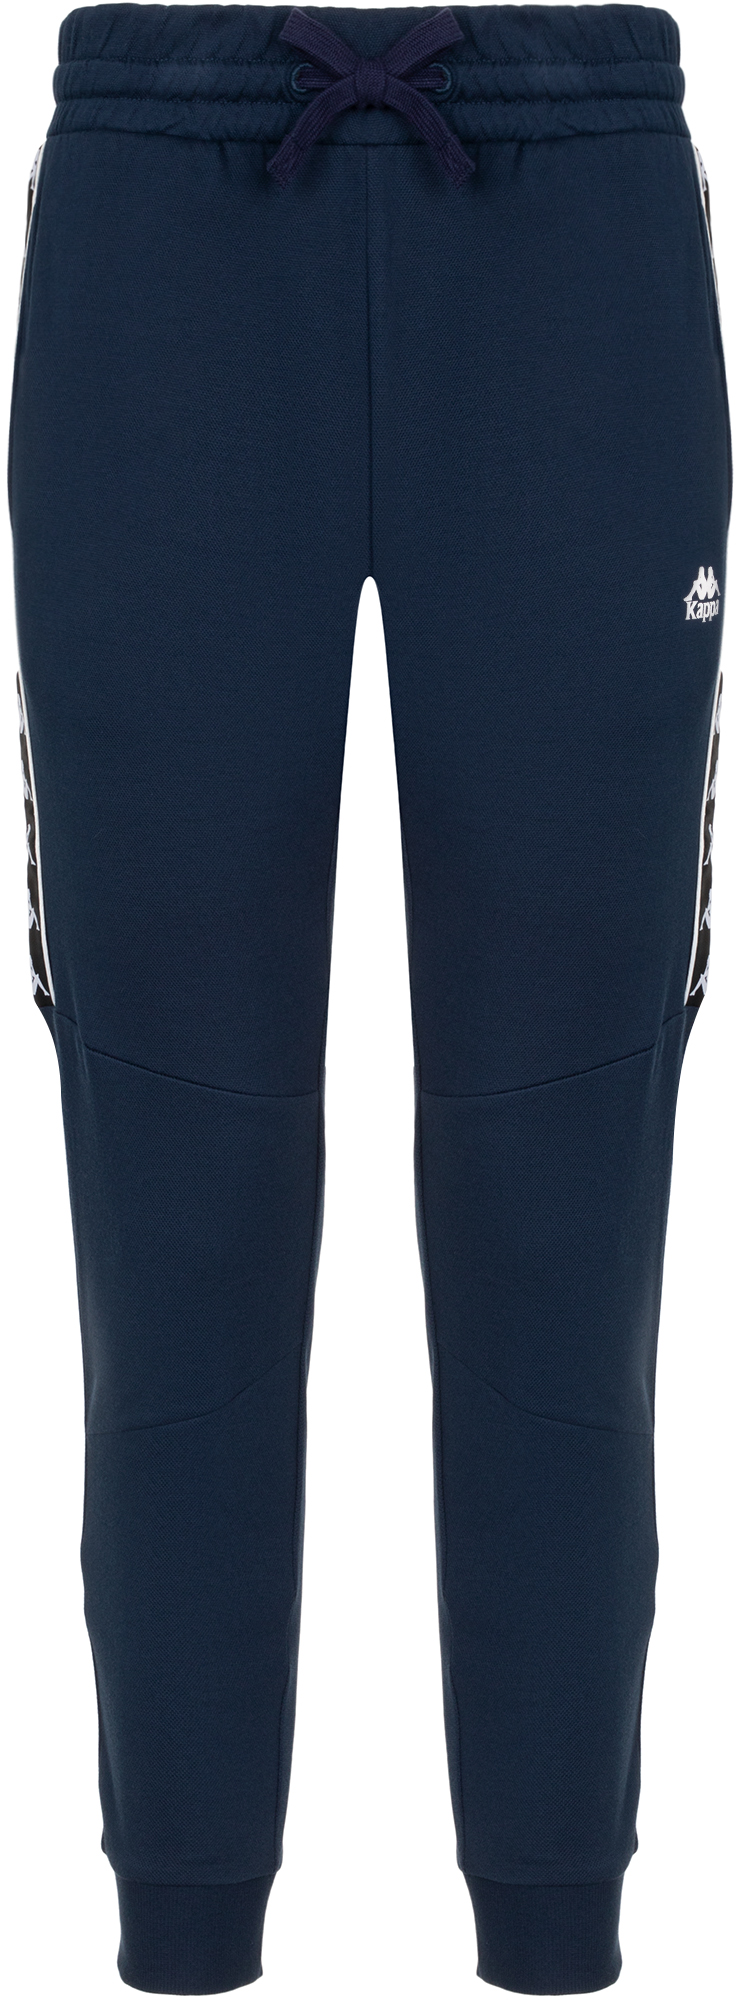 Фото - Kappa Брюки мужские Kappa, размер 54 брюки мужские kappa men s trousers цвет графитовый 304jr00 3a размер xl 52